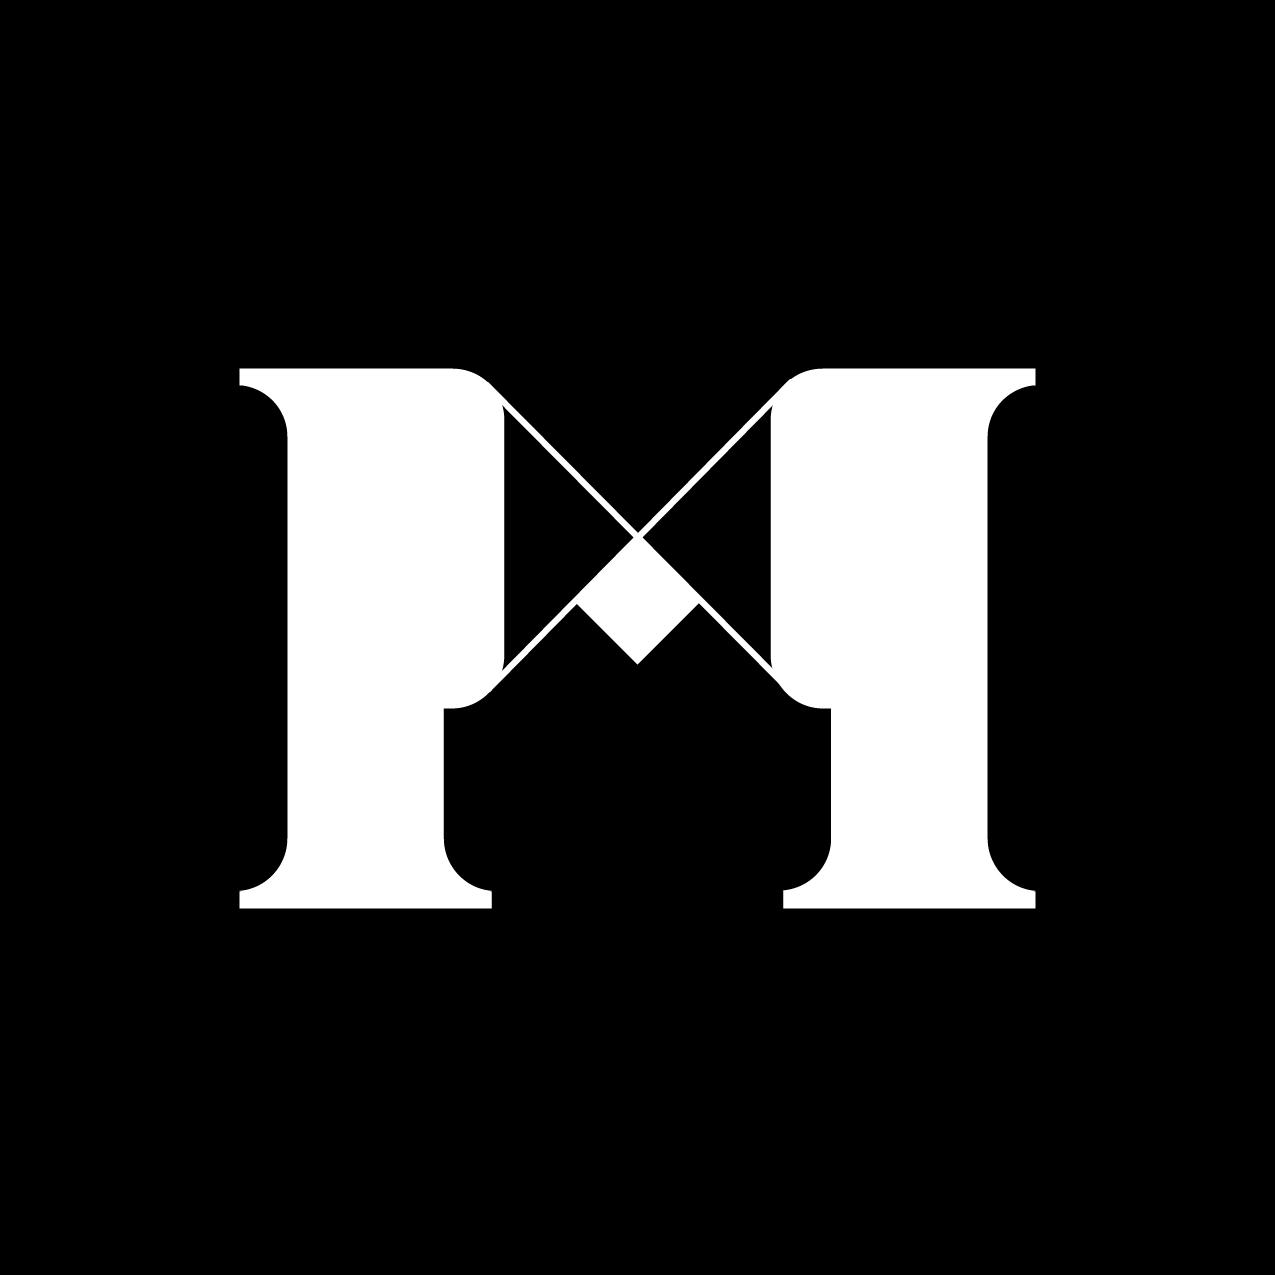 Letter M5 Design by Furia